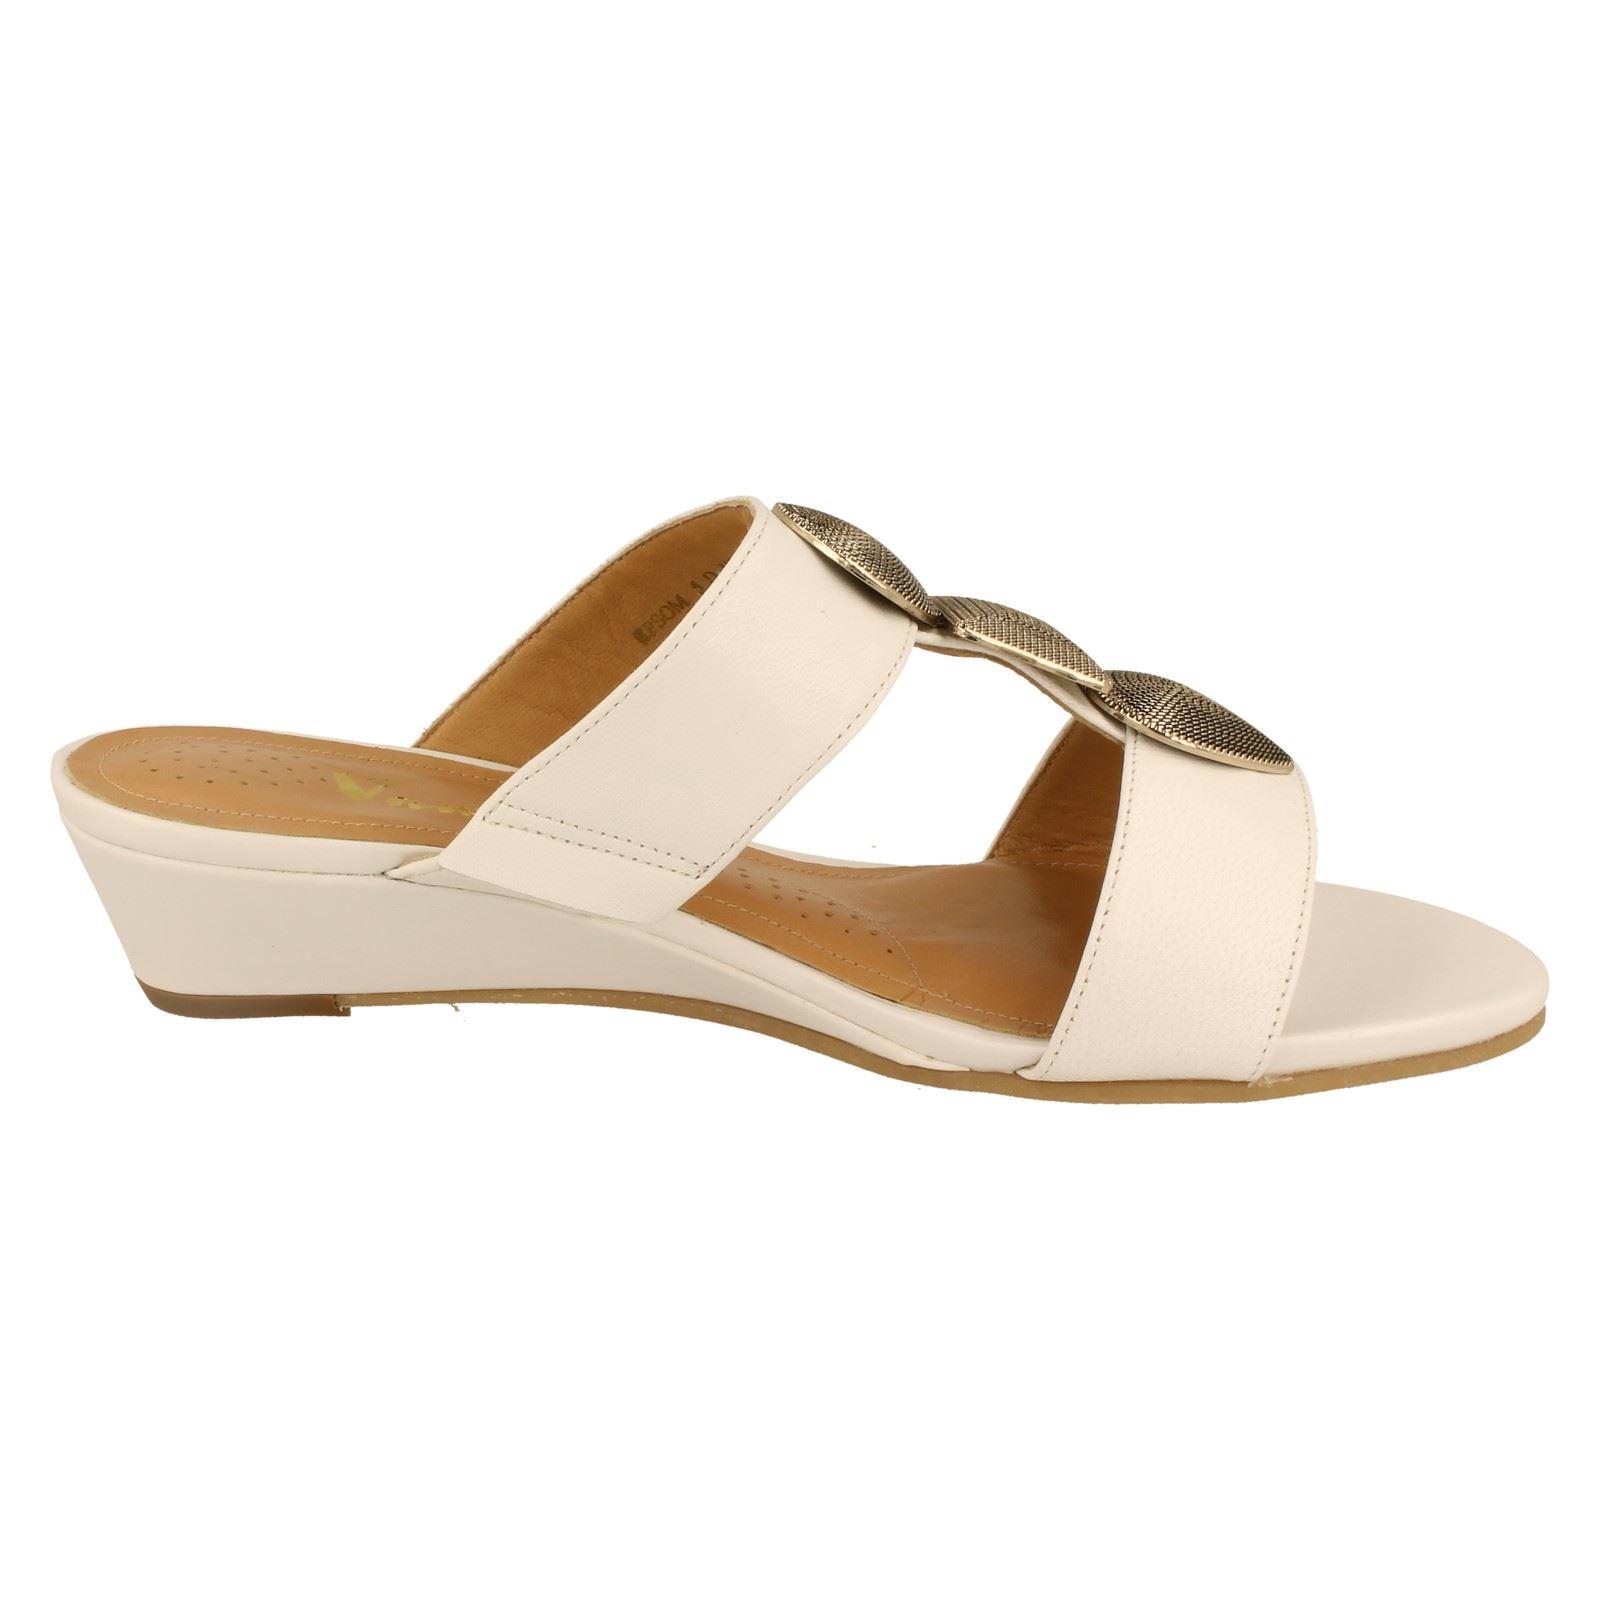 fa611efc02726 Ladies Van Dal Mule Sandals Style Epsom -W